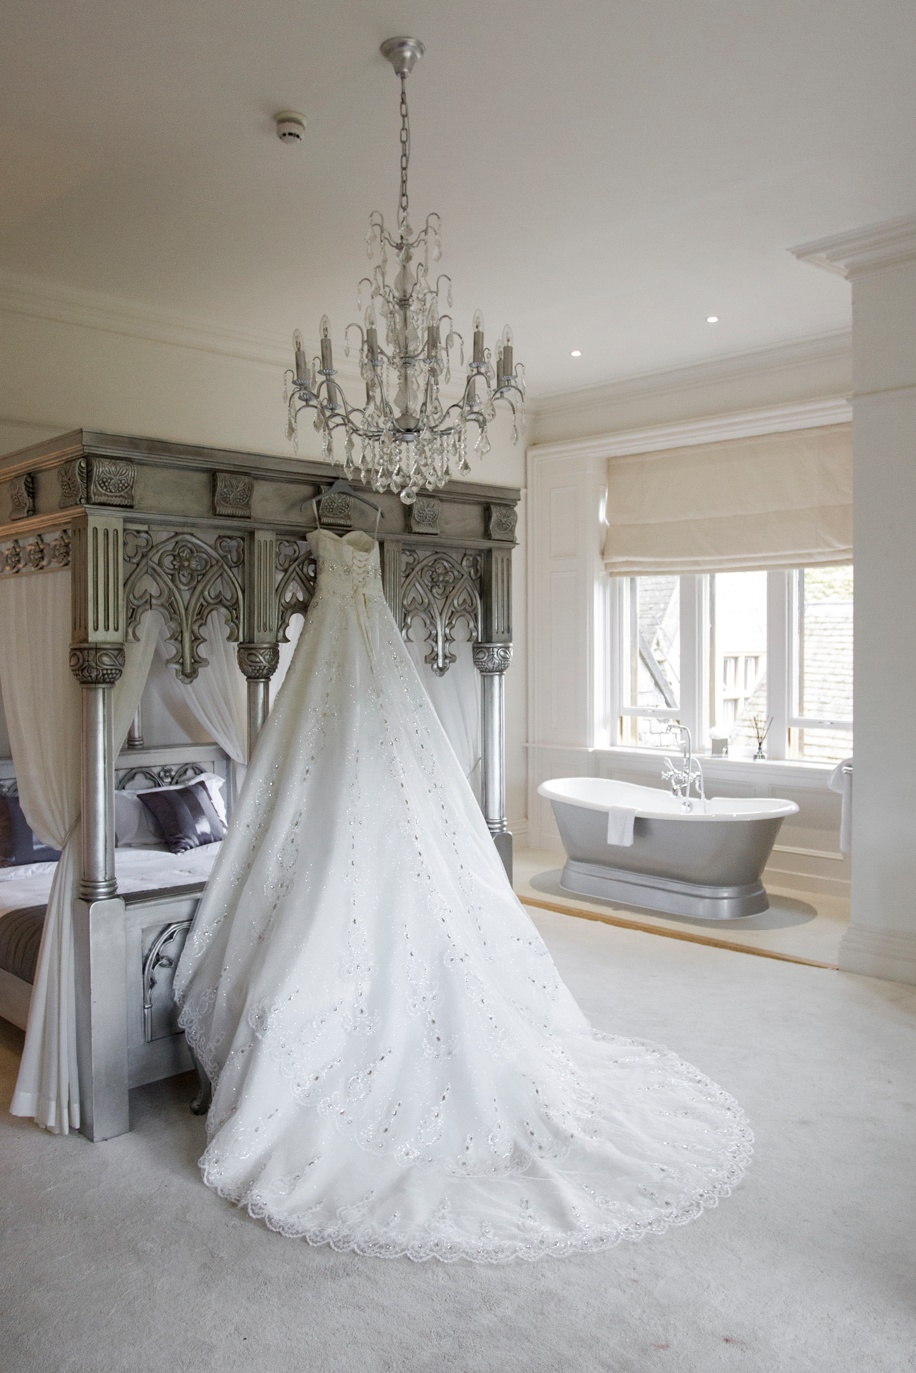 Stunning wedding dress - Manor by the Lake wedding - Martin Bell Photography